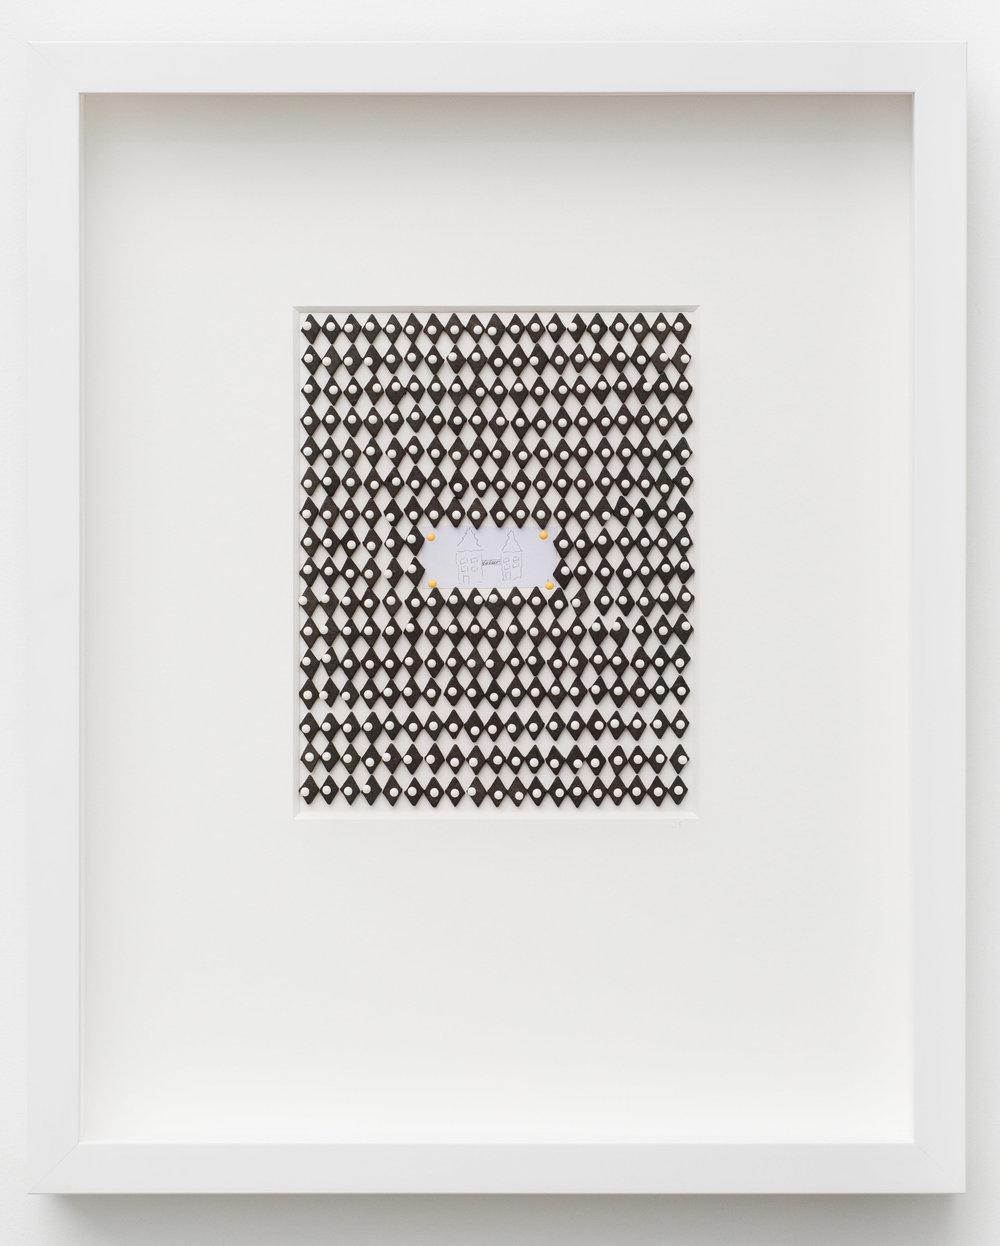 Jacqueline-Surdell-Artist-Installation-Kerk-Straat-Orwellian-Offspring-Work-06.jpg